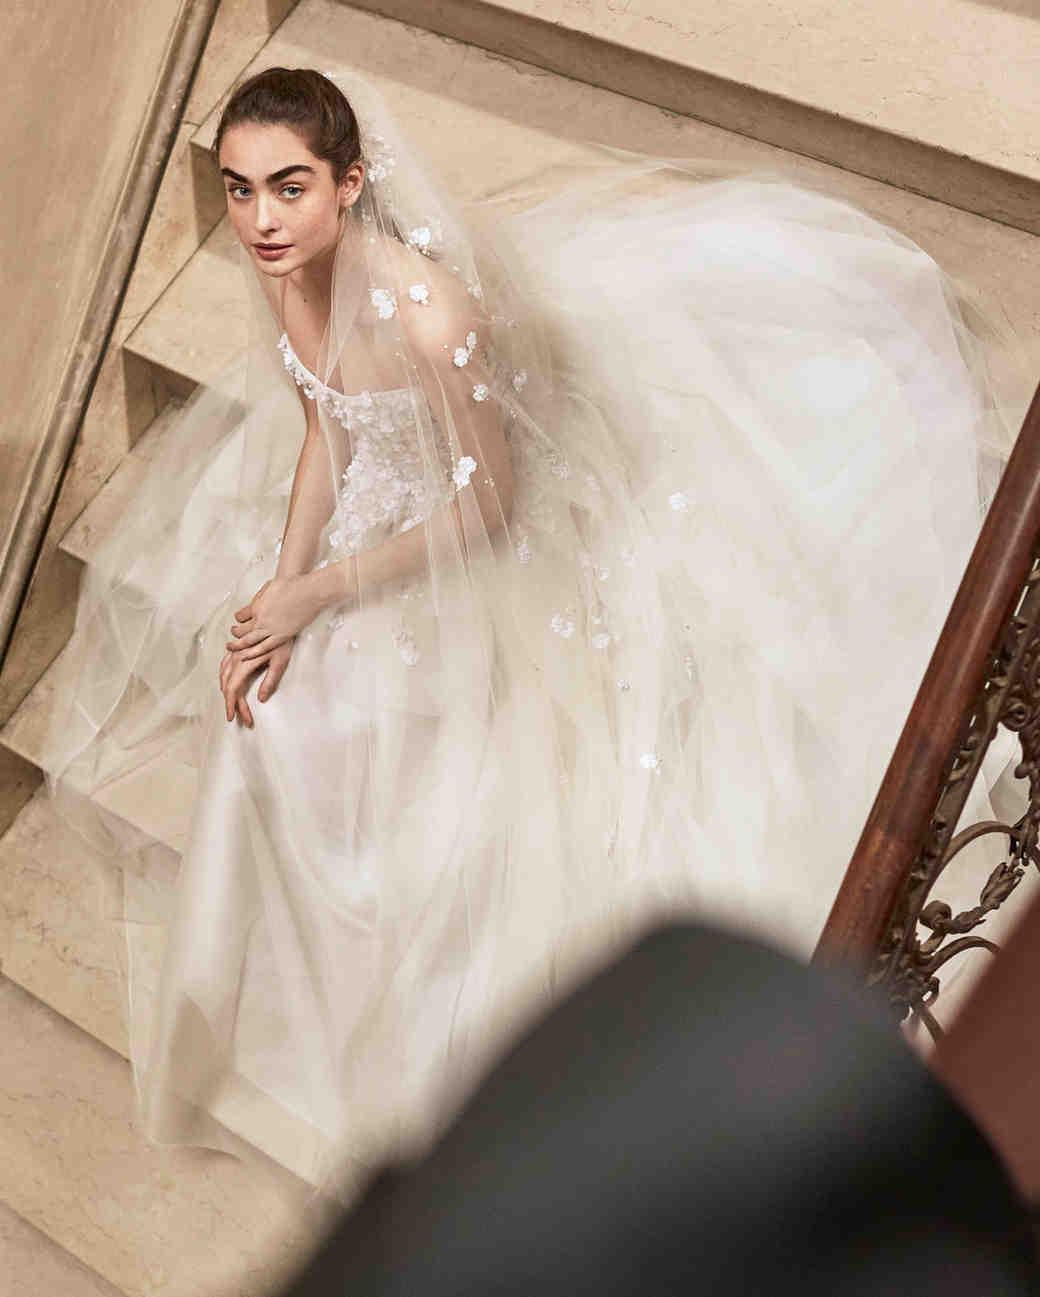 Watch Carolina Herrera Spring 2019 Bridal Collection video